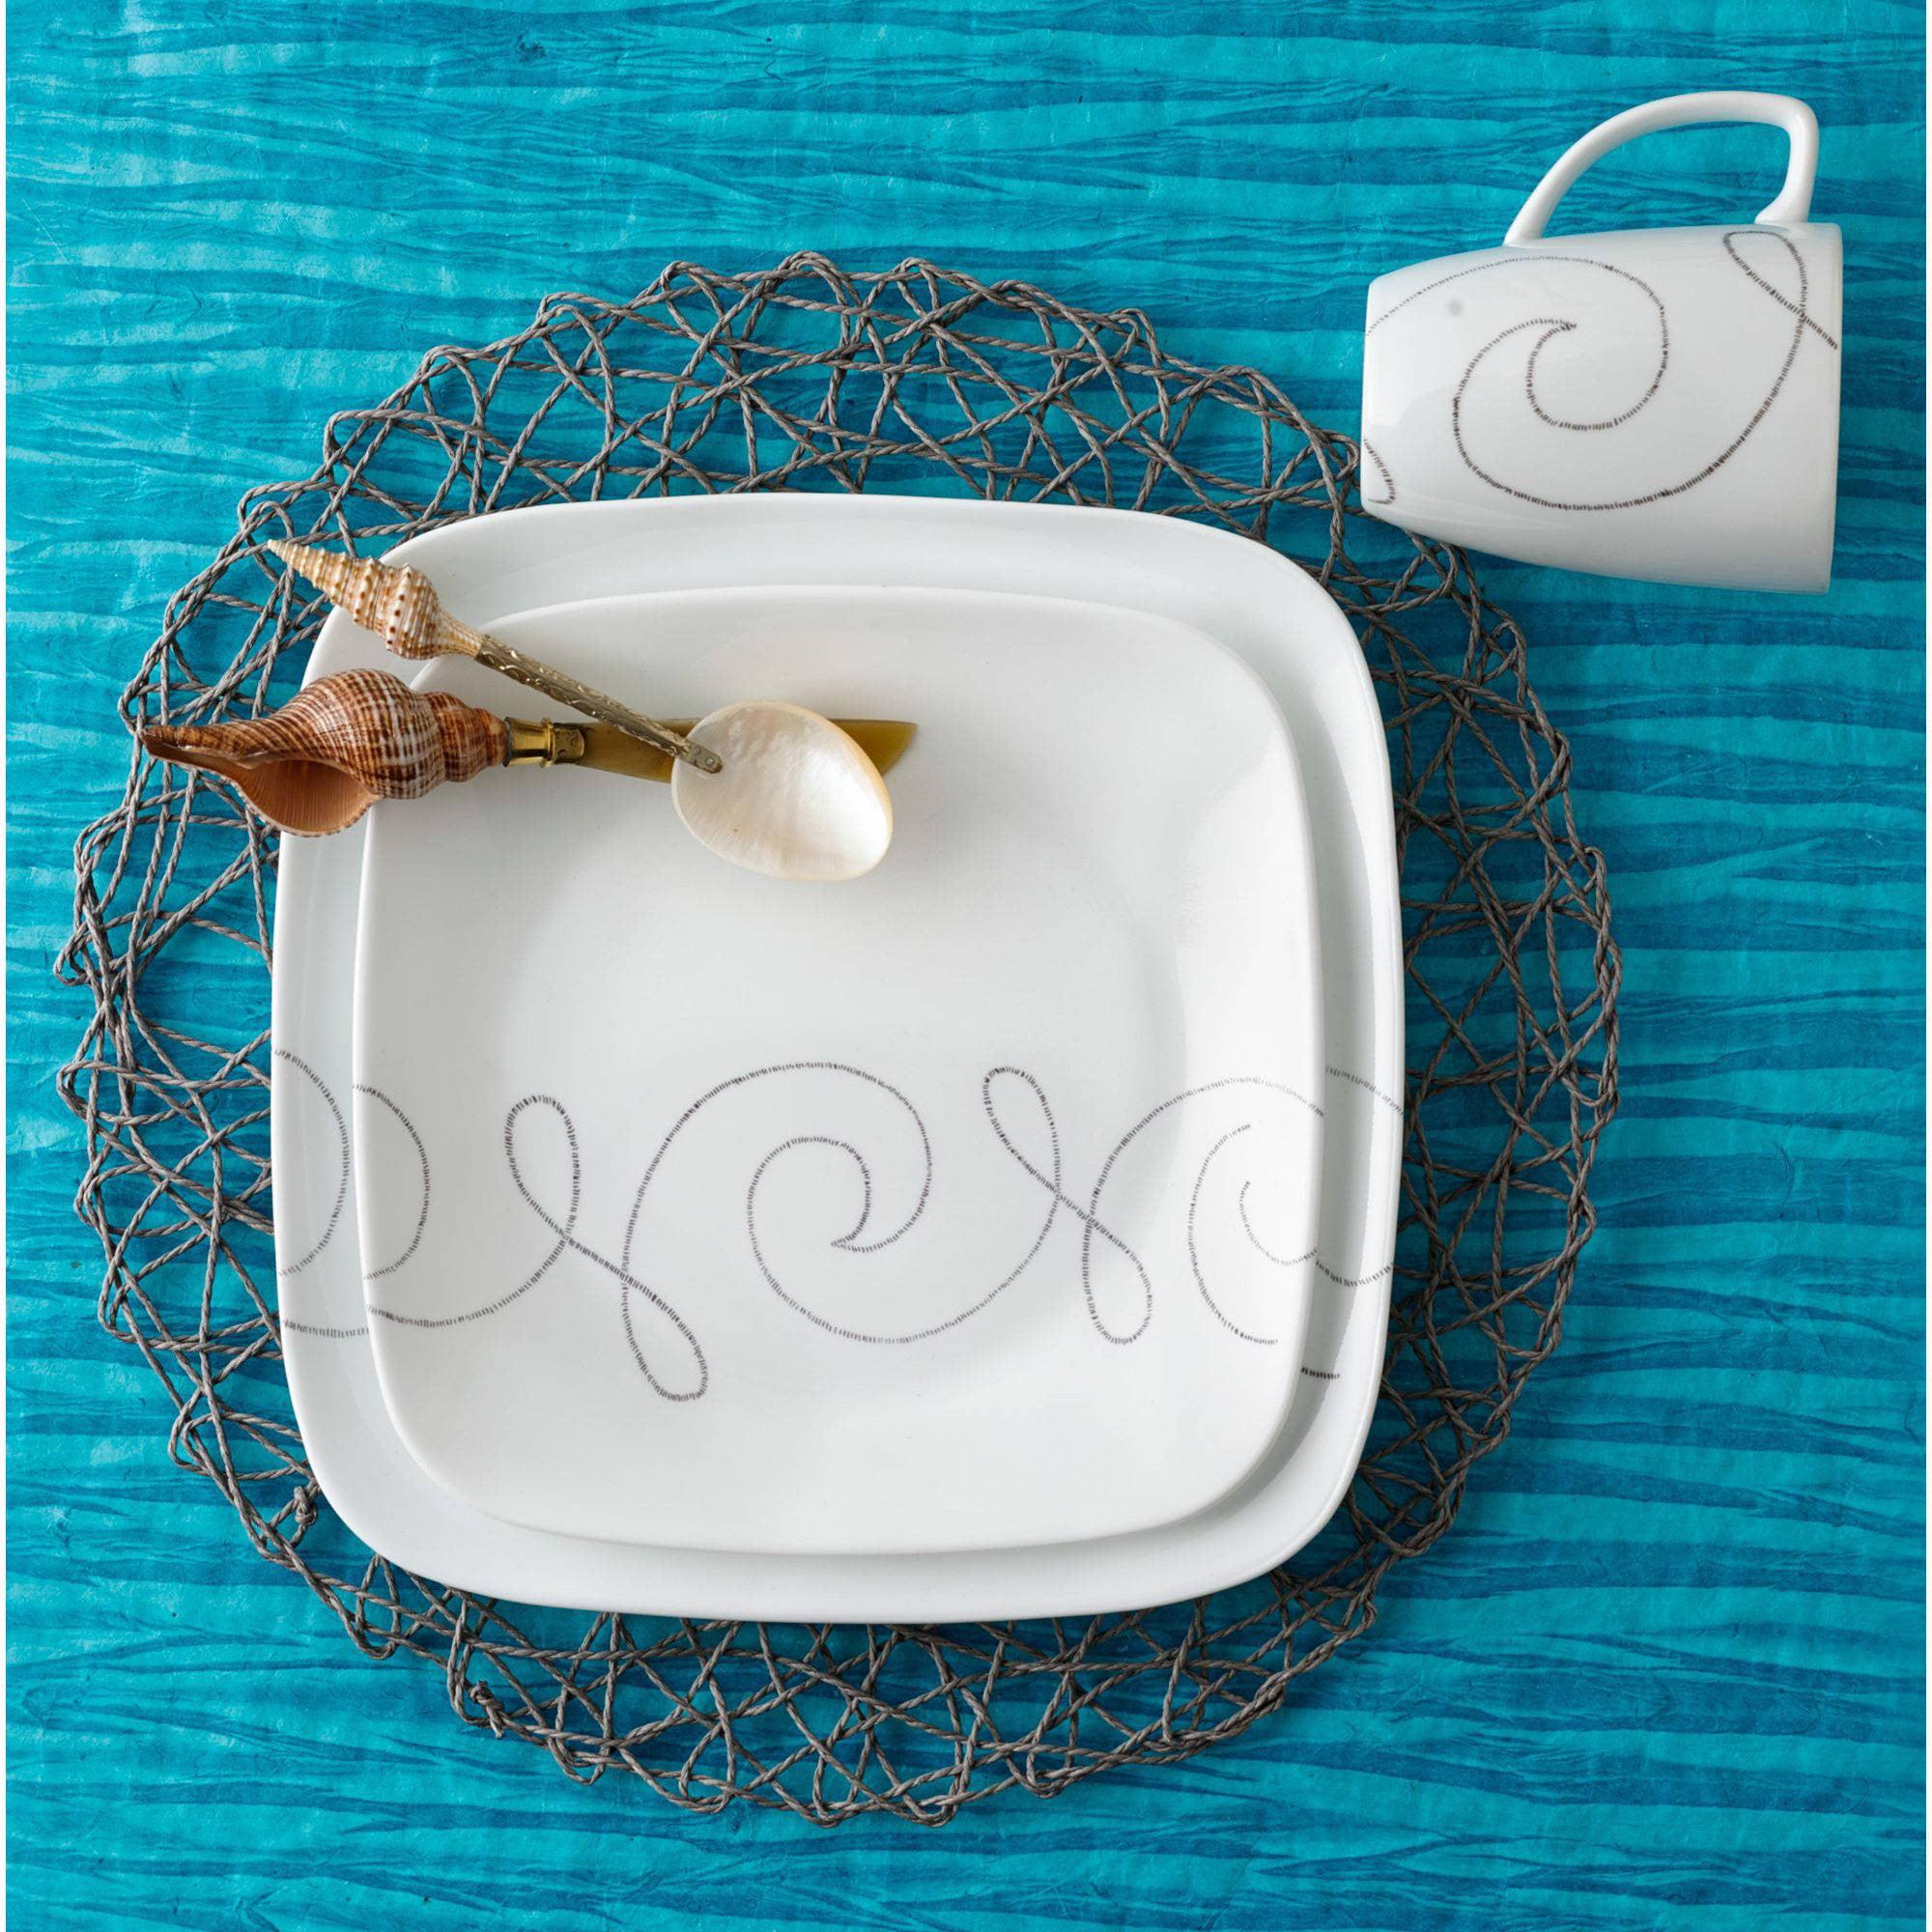 Corelle Squares Endless Thread 16-Piece Dinnerware Set